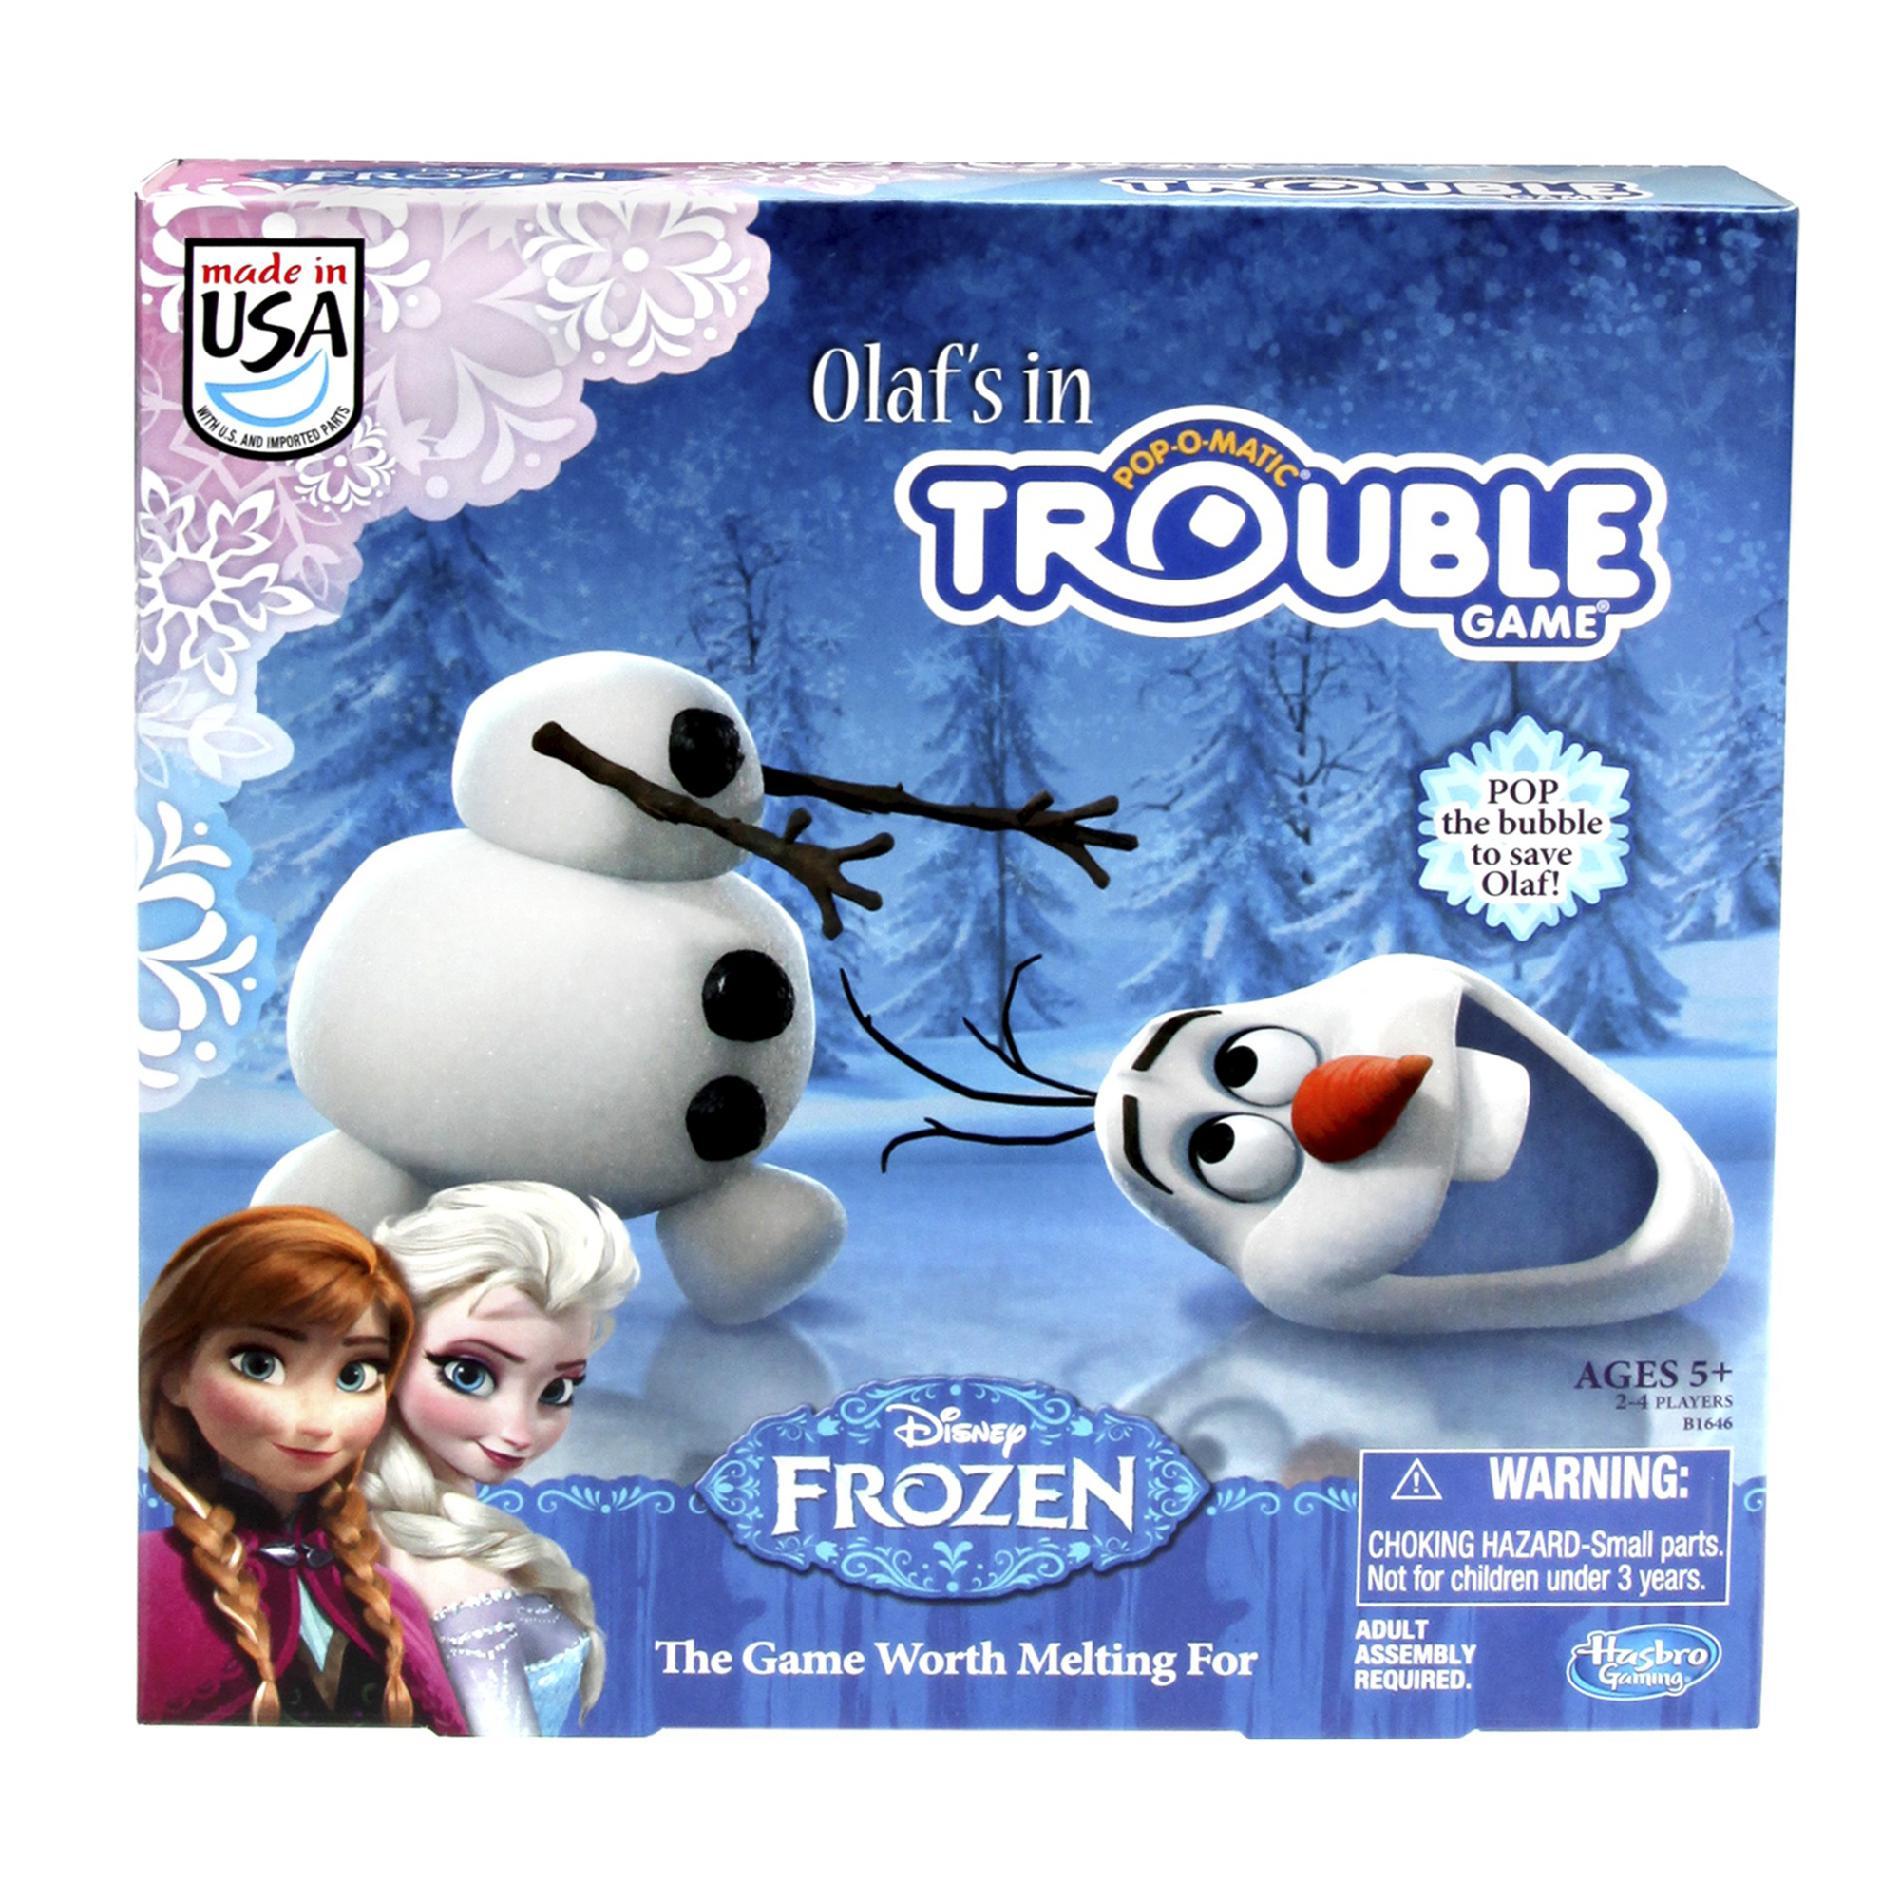 Disney Frozen Olaf's in Trouble Game PartNumber: 004W008377585001P KsnValue: 8377585 MfgPartNumber: B16460000